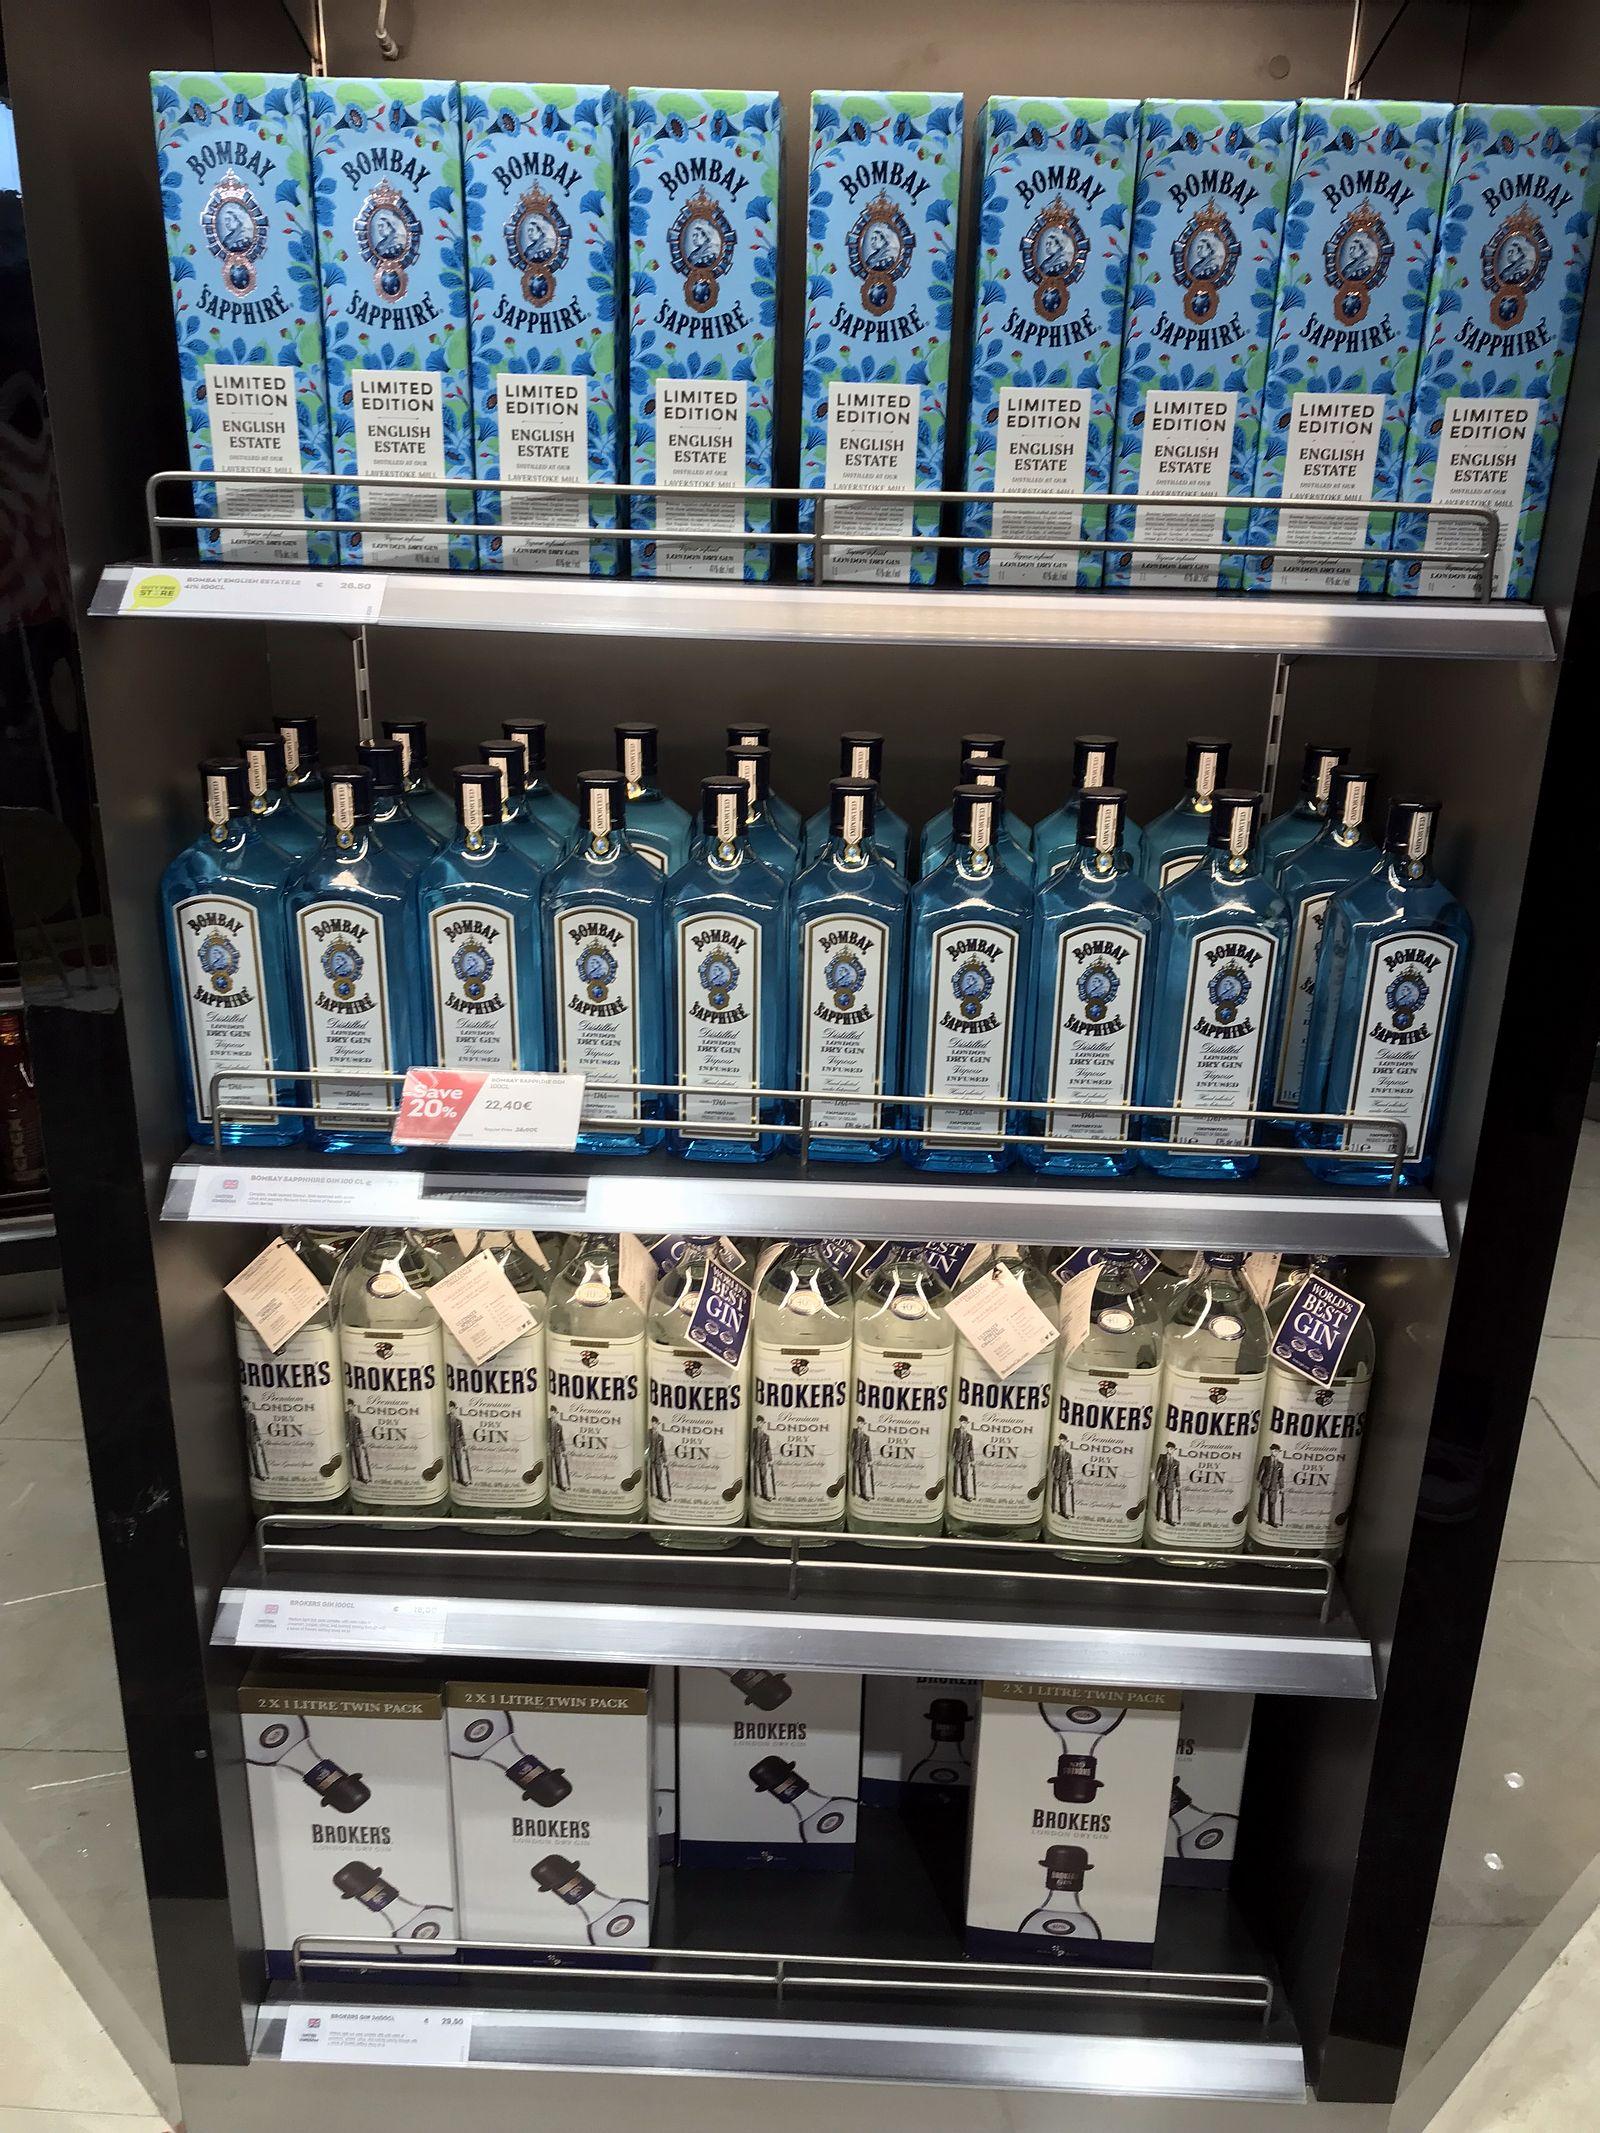 Duty free Antalya, august 2019, Gin Bombay Sapphire, Broker's